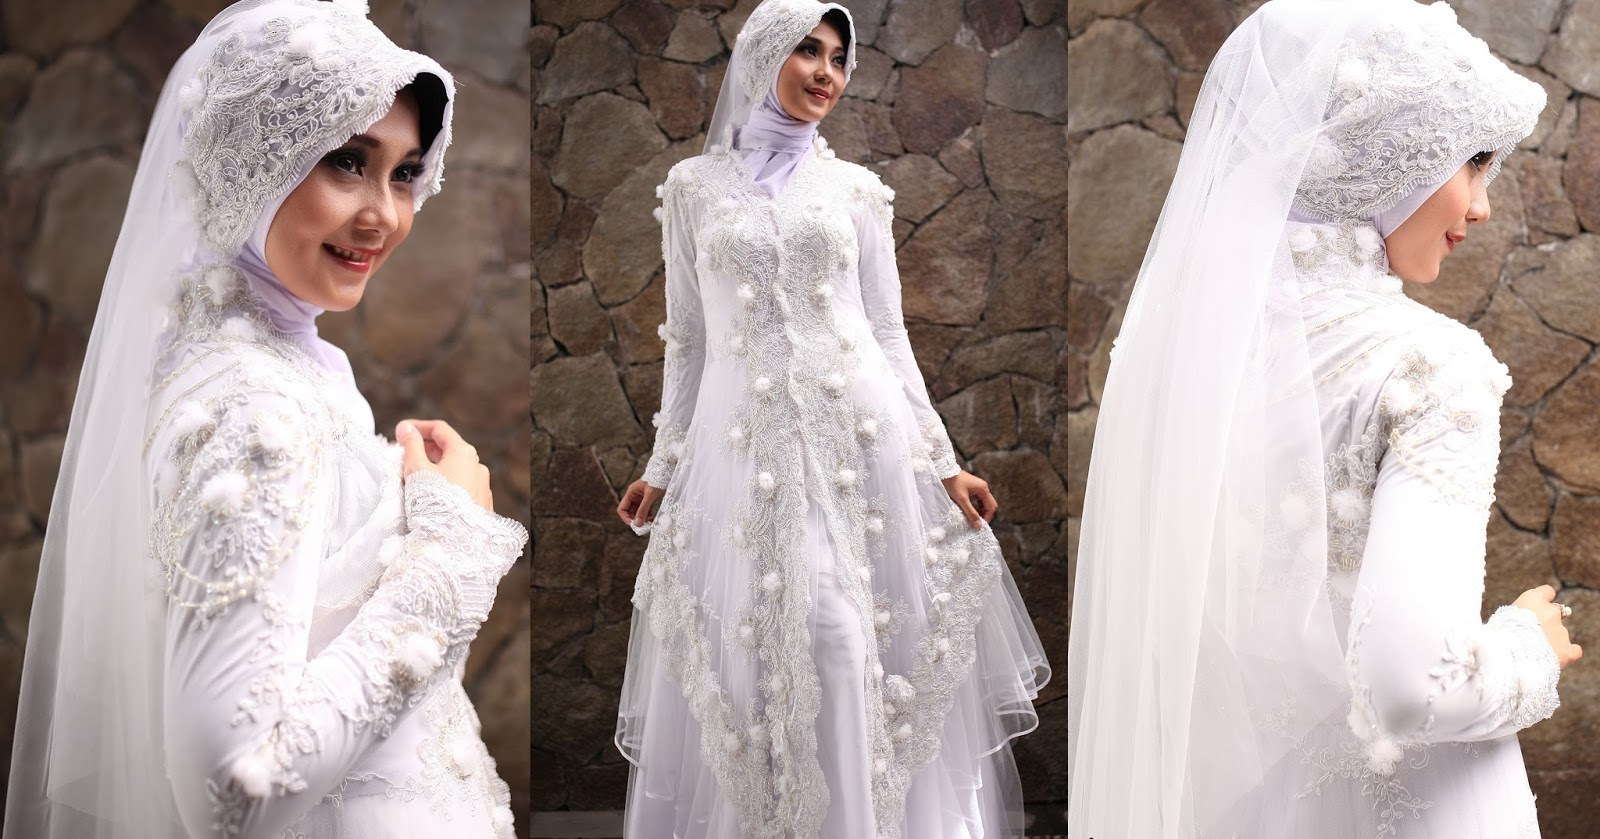 Design Baju Pengantin Muslimah Bercadar E9dx Memilih Baju Pengantin Untuk Muslimah Galeh Aji